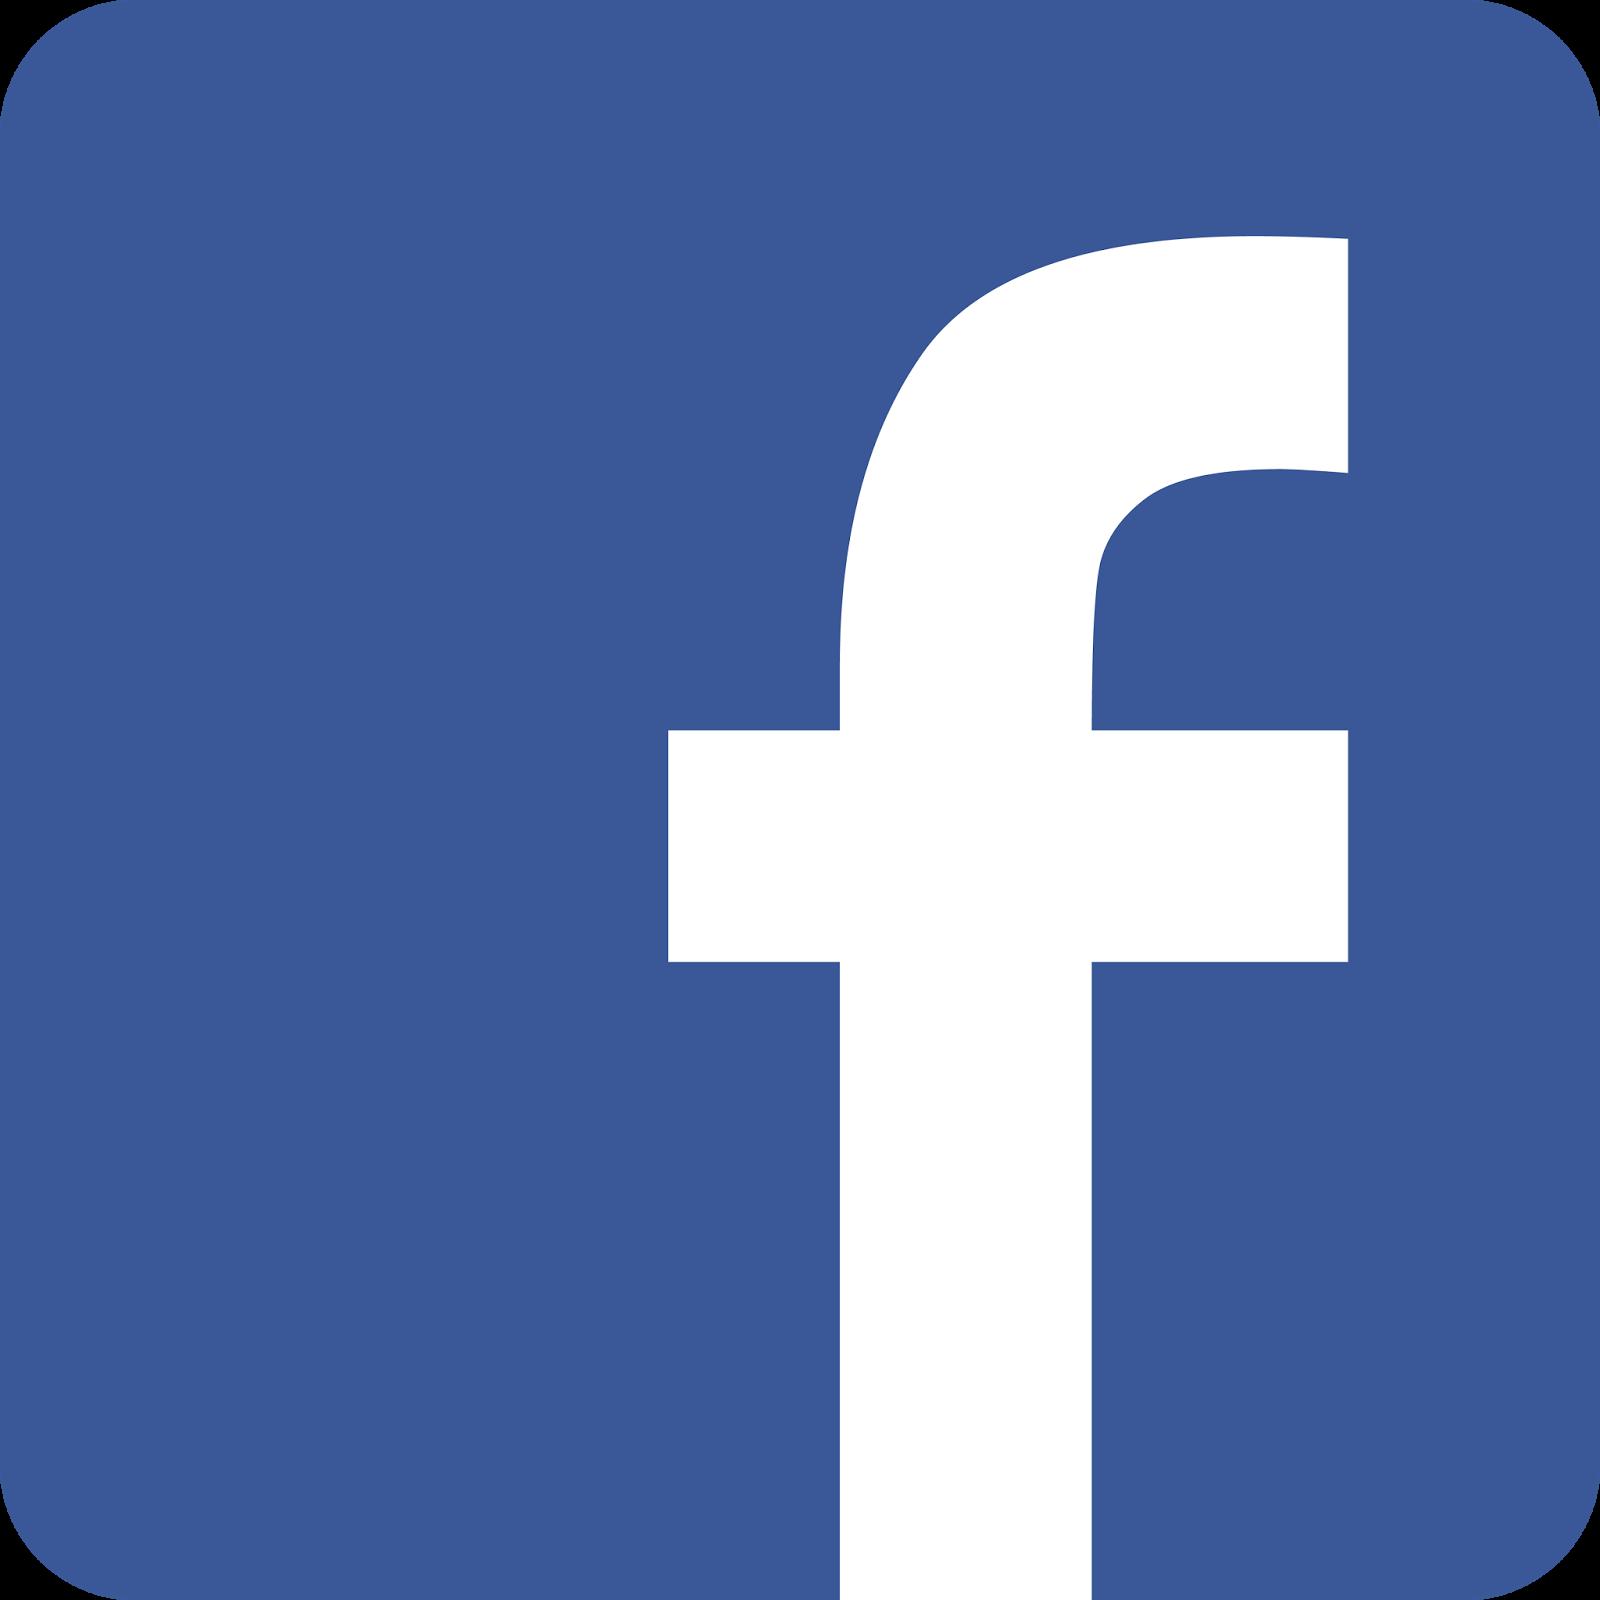 facebook logo png 38347